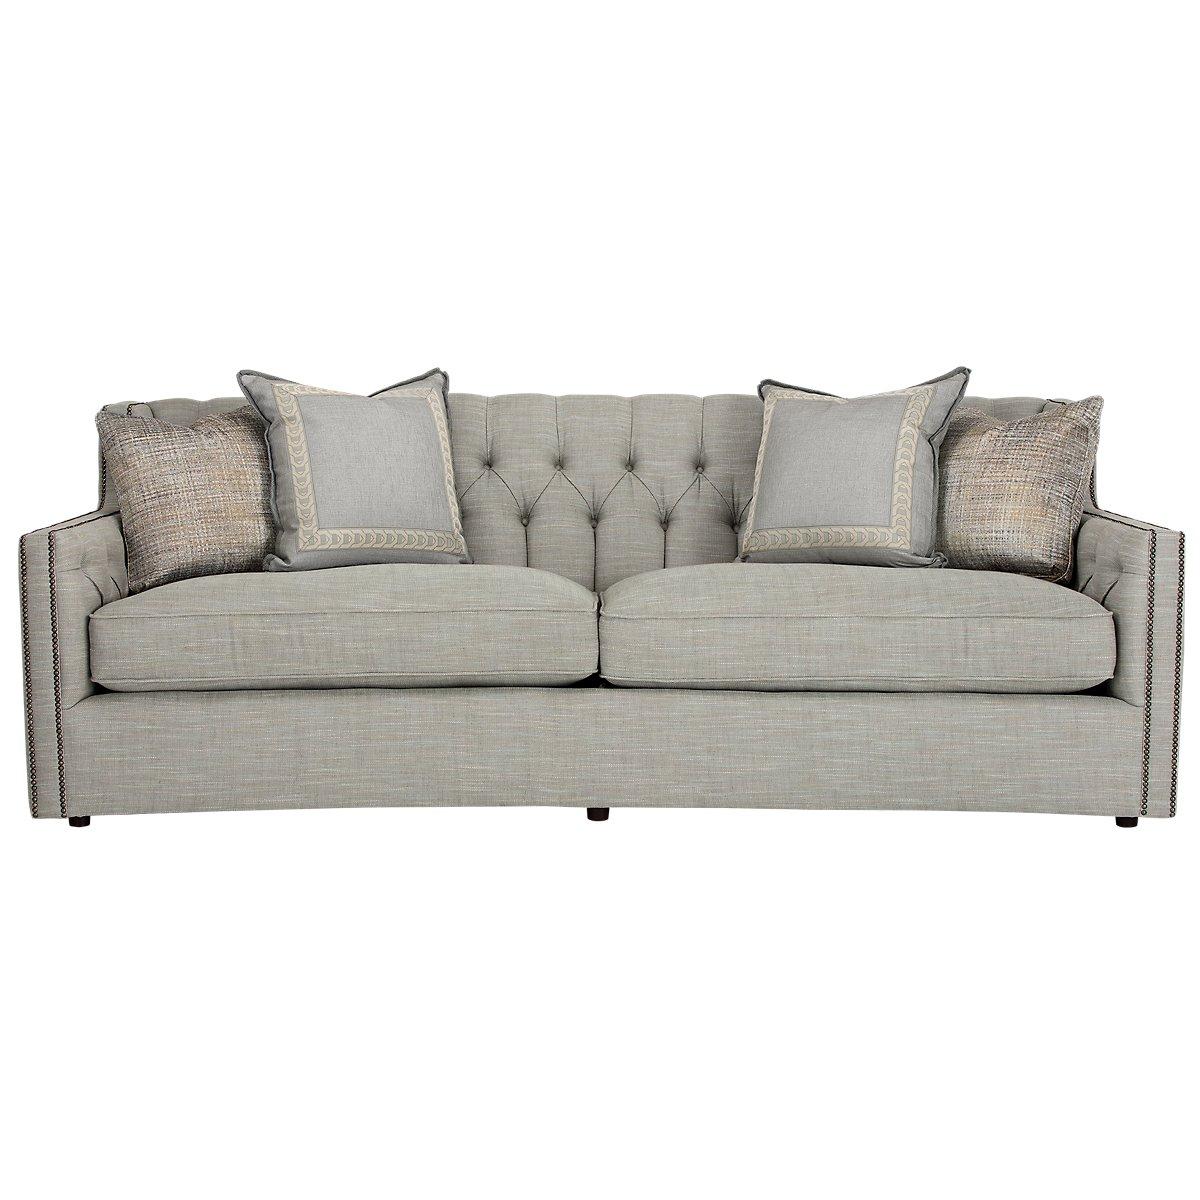 bernhardt living room furniture. Candace Light Blue Fabric Sofa City Furniture  Lt